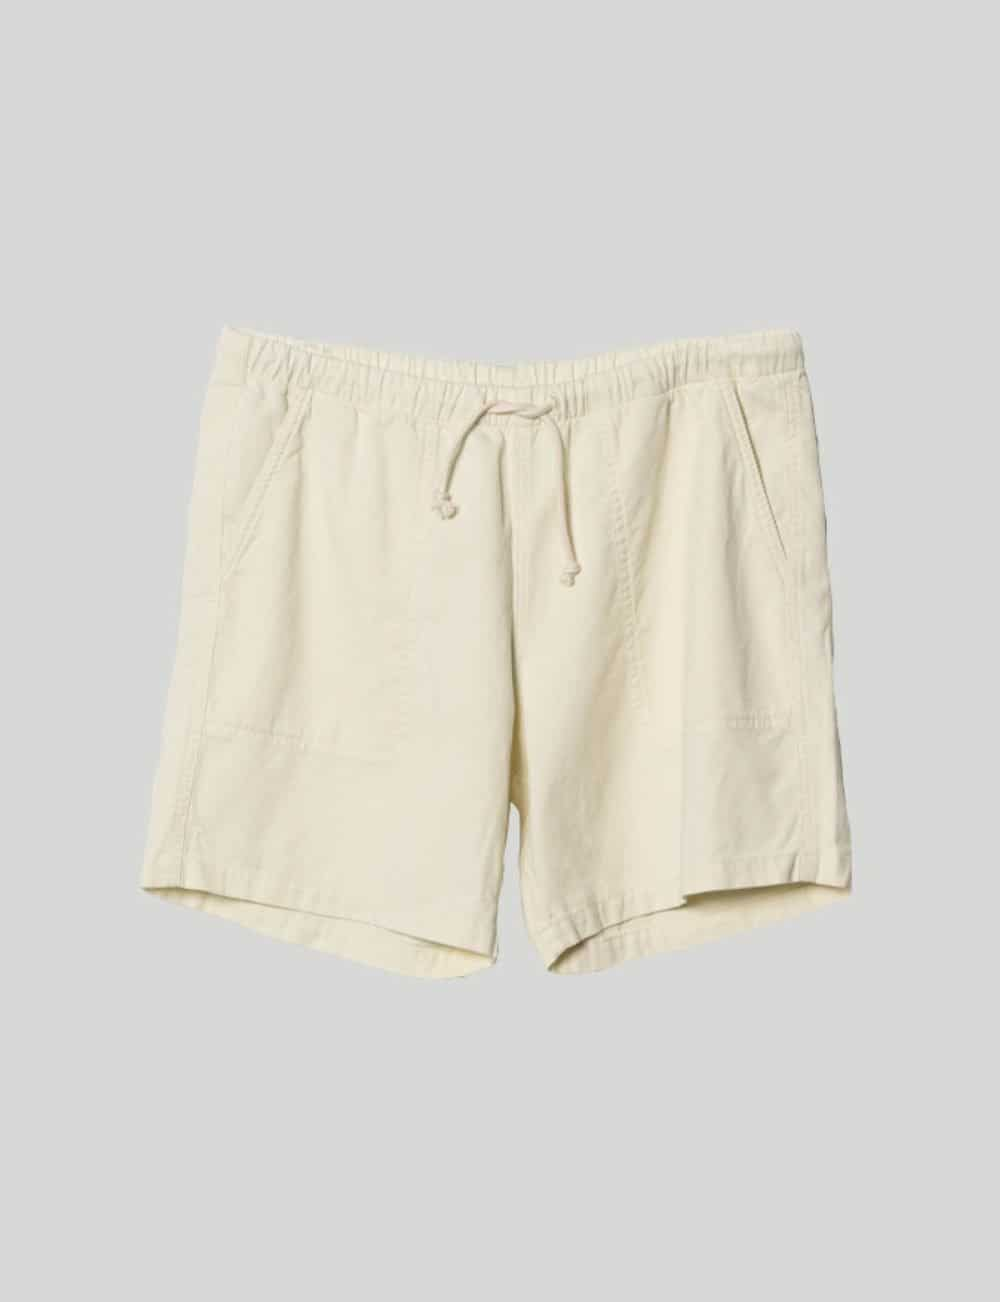 Castart - La Paz - Formigal Shorts - Off-white